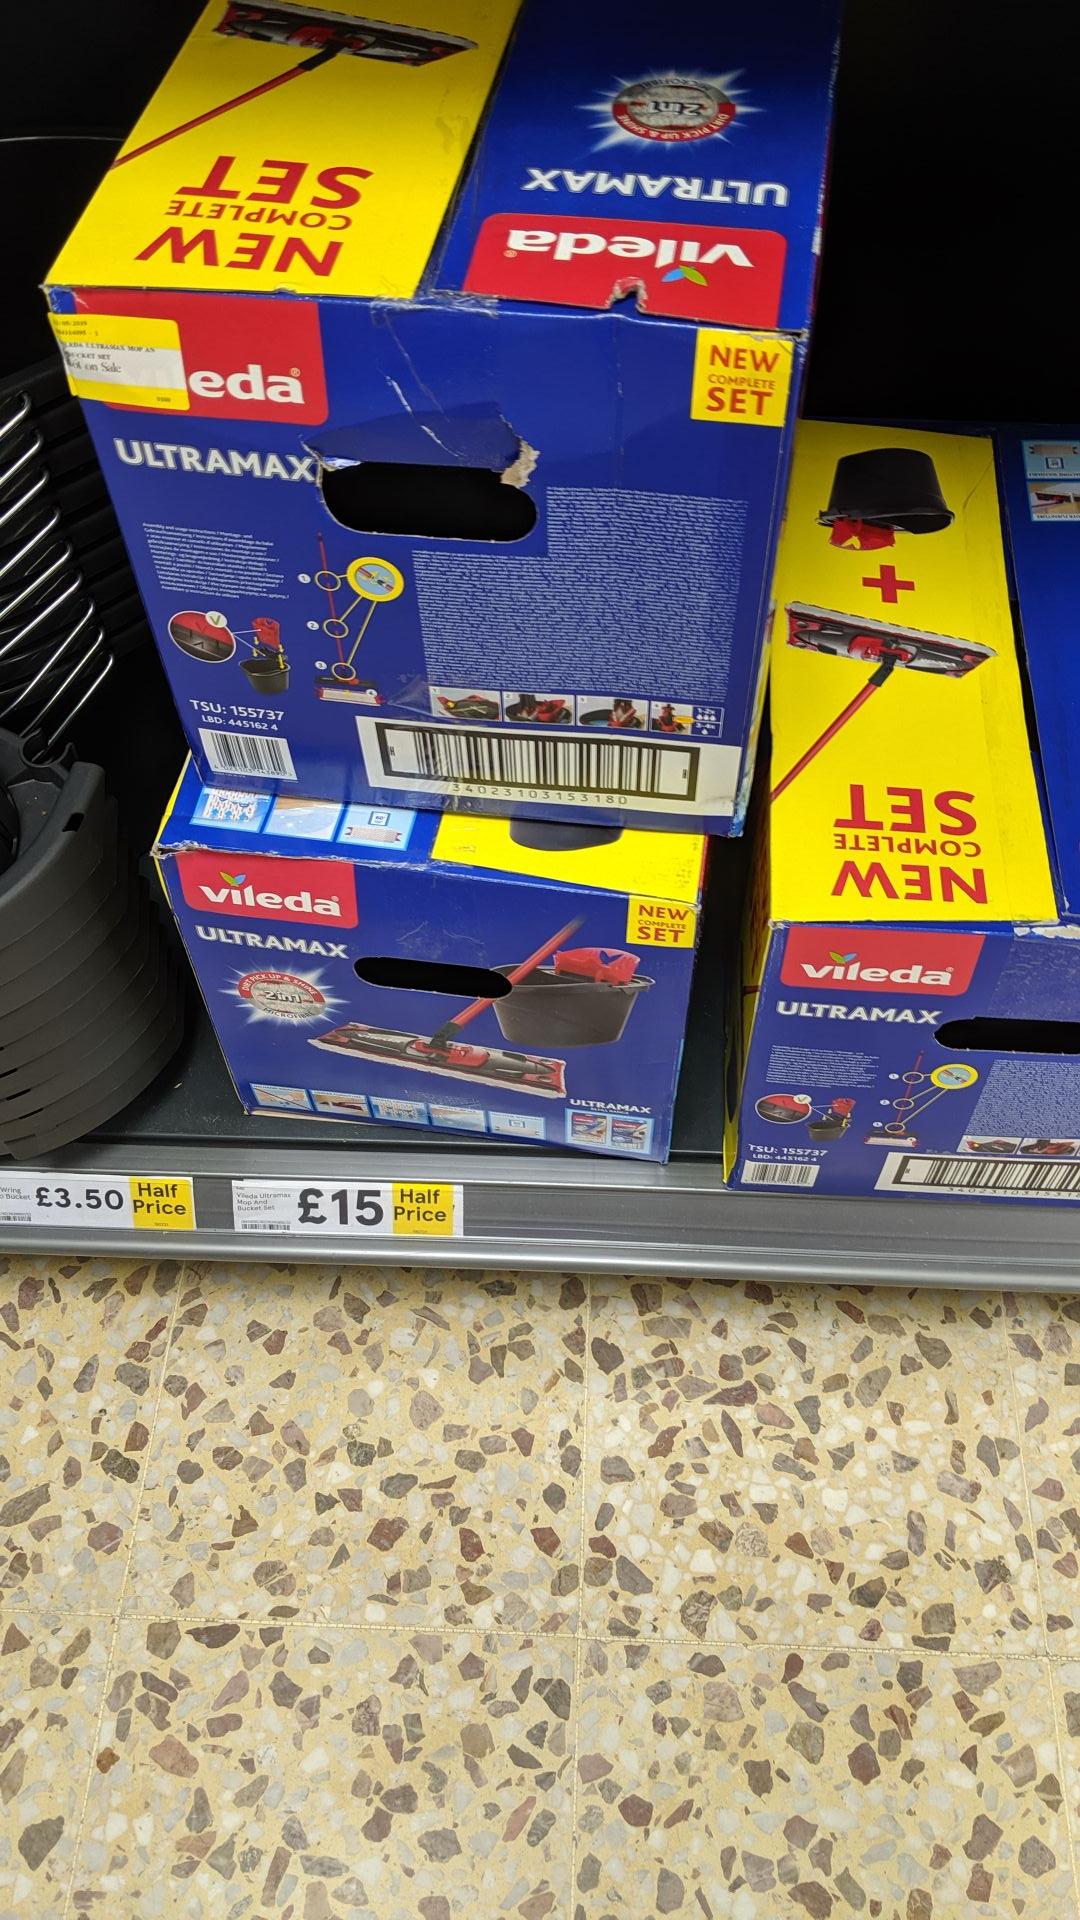 Vileda Ultramax Mop and Bucket Set Half Price - £15 @ Tesco Royston